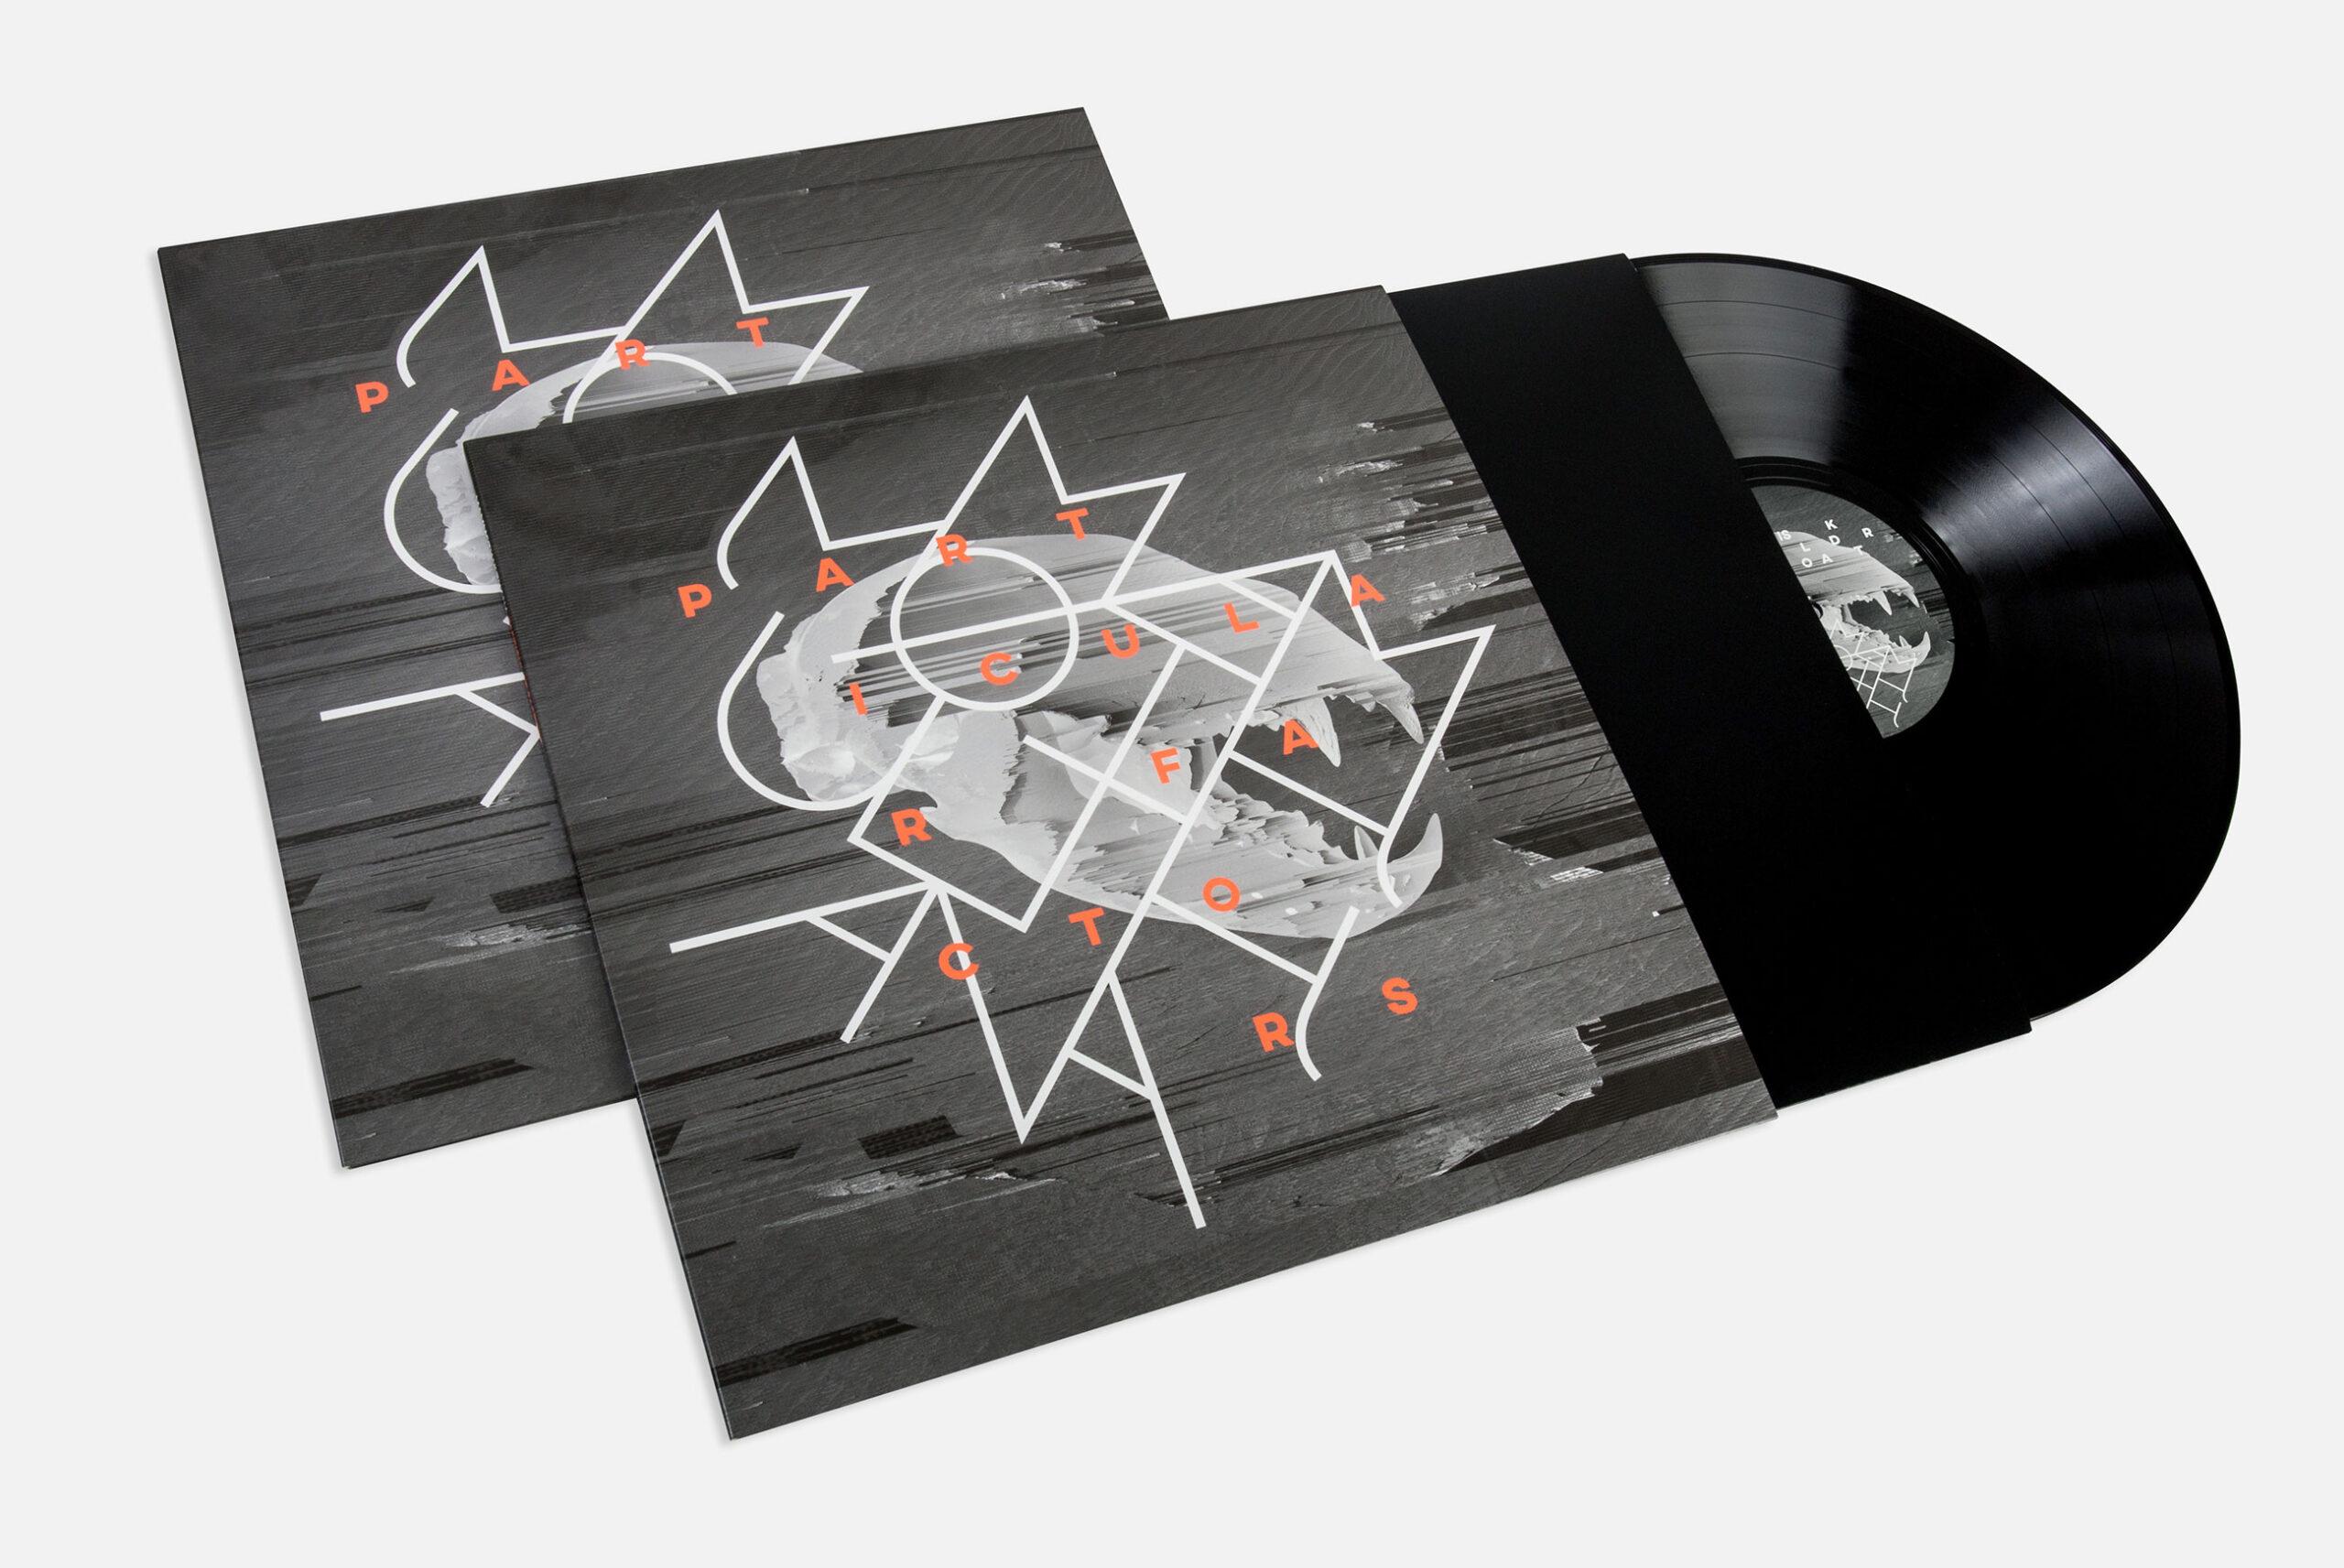 Jacek Doroszenko and Rafał Kołacki - Mammoth Ulthana, Particular Factors, music album 01